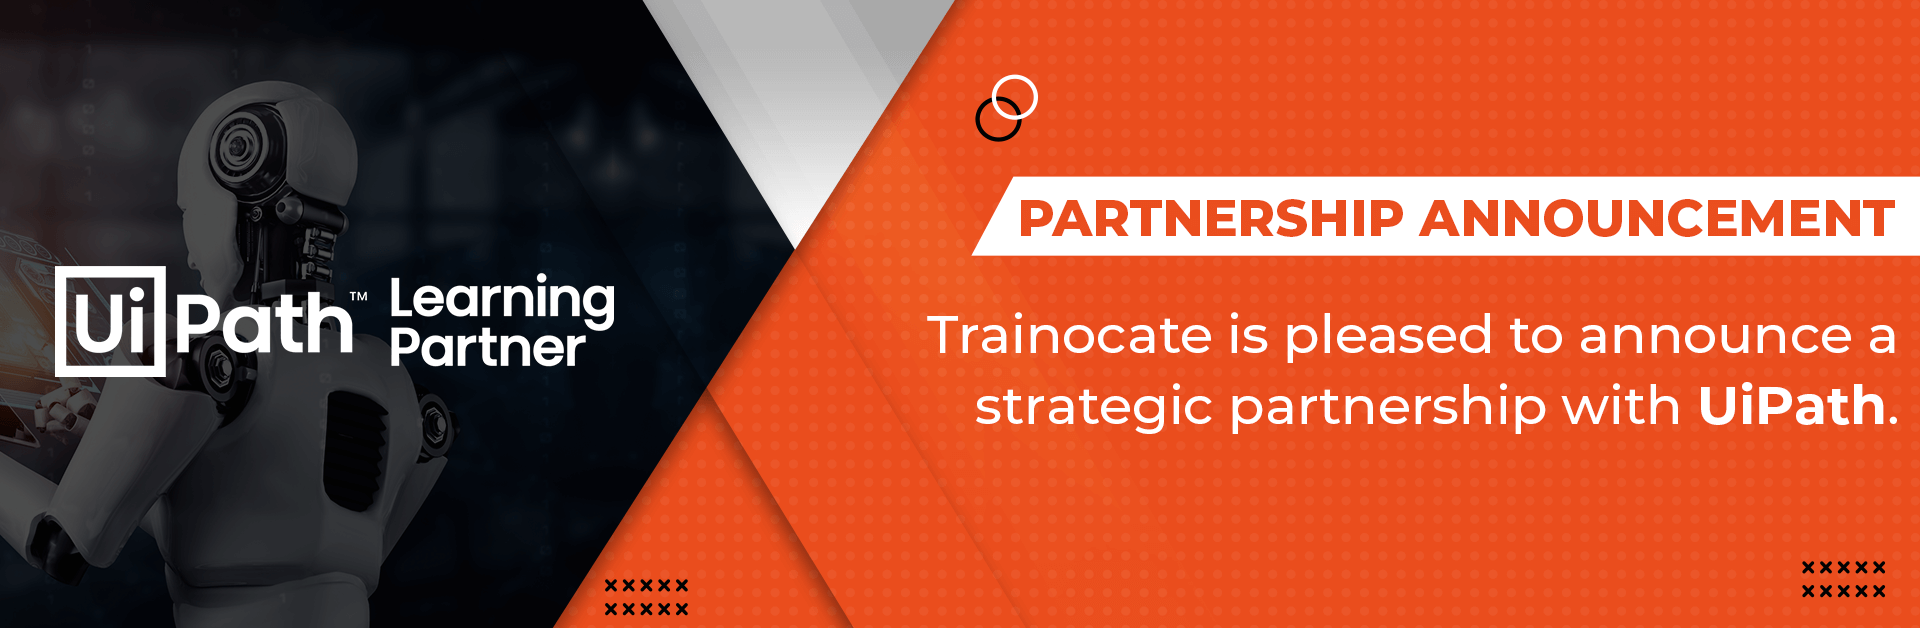 trainocate-partnership-announcement-banner.png